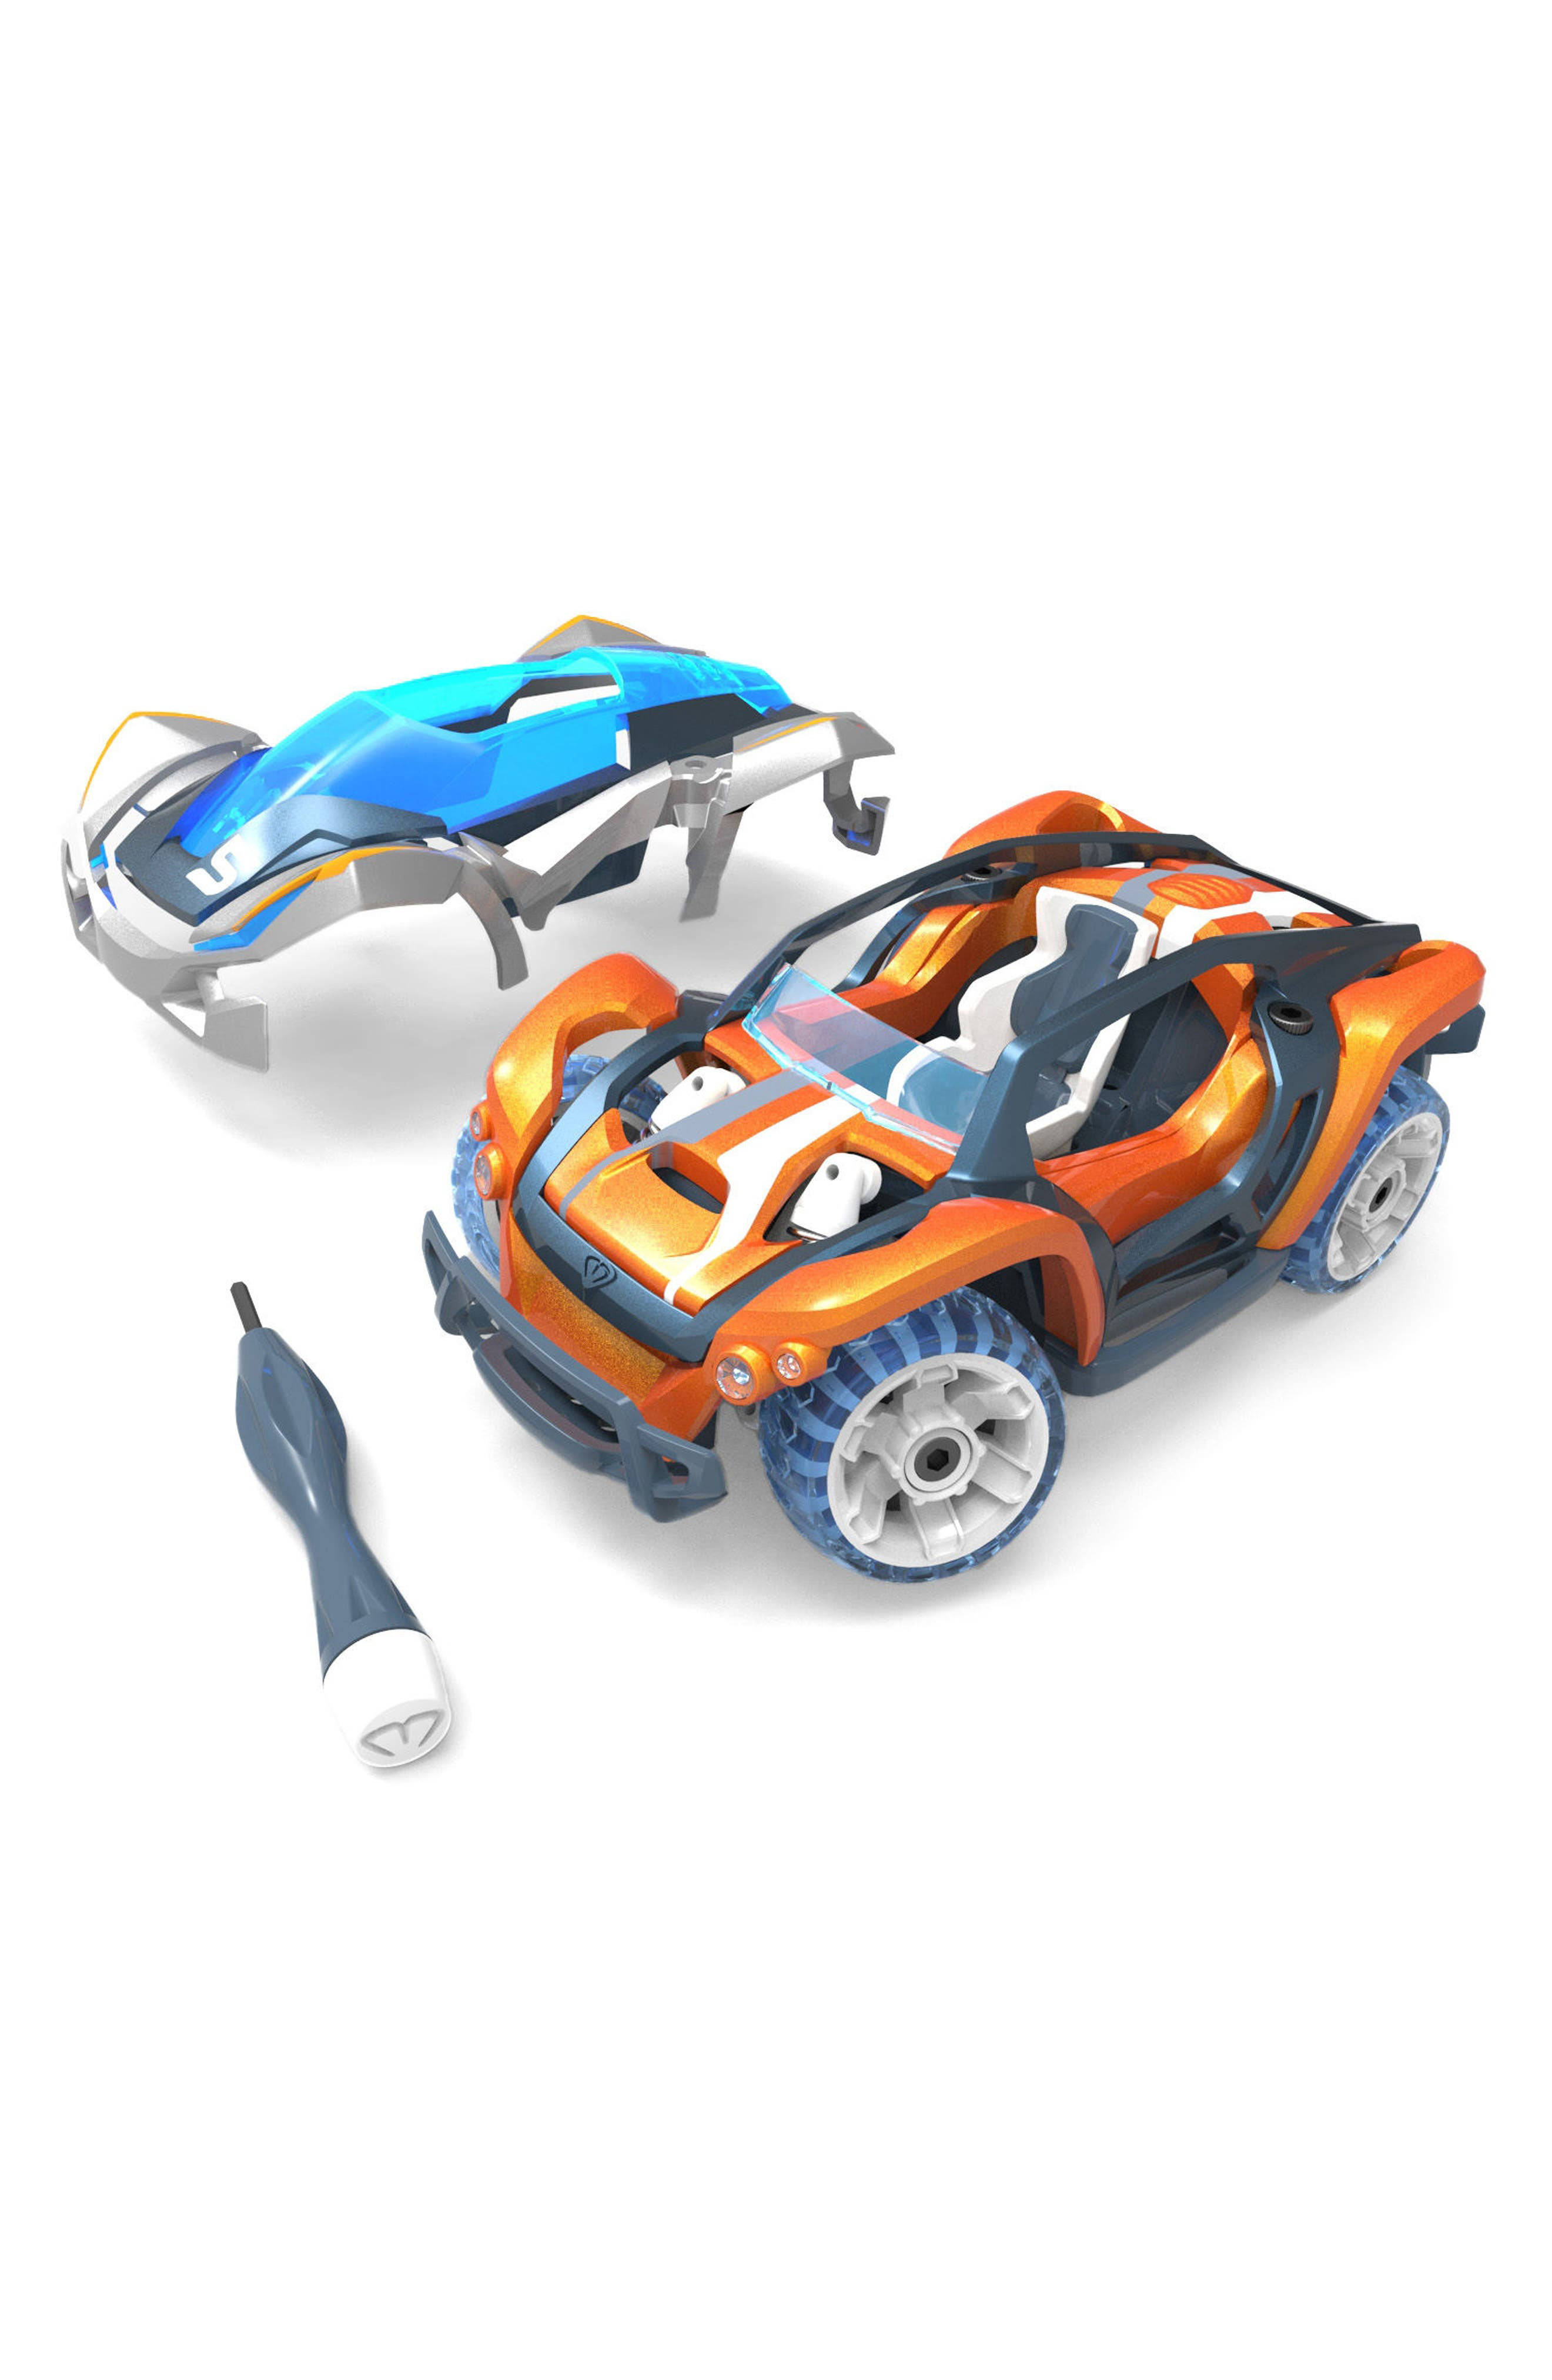 Modarri Delux X1 Dirt Car Kit